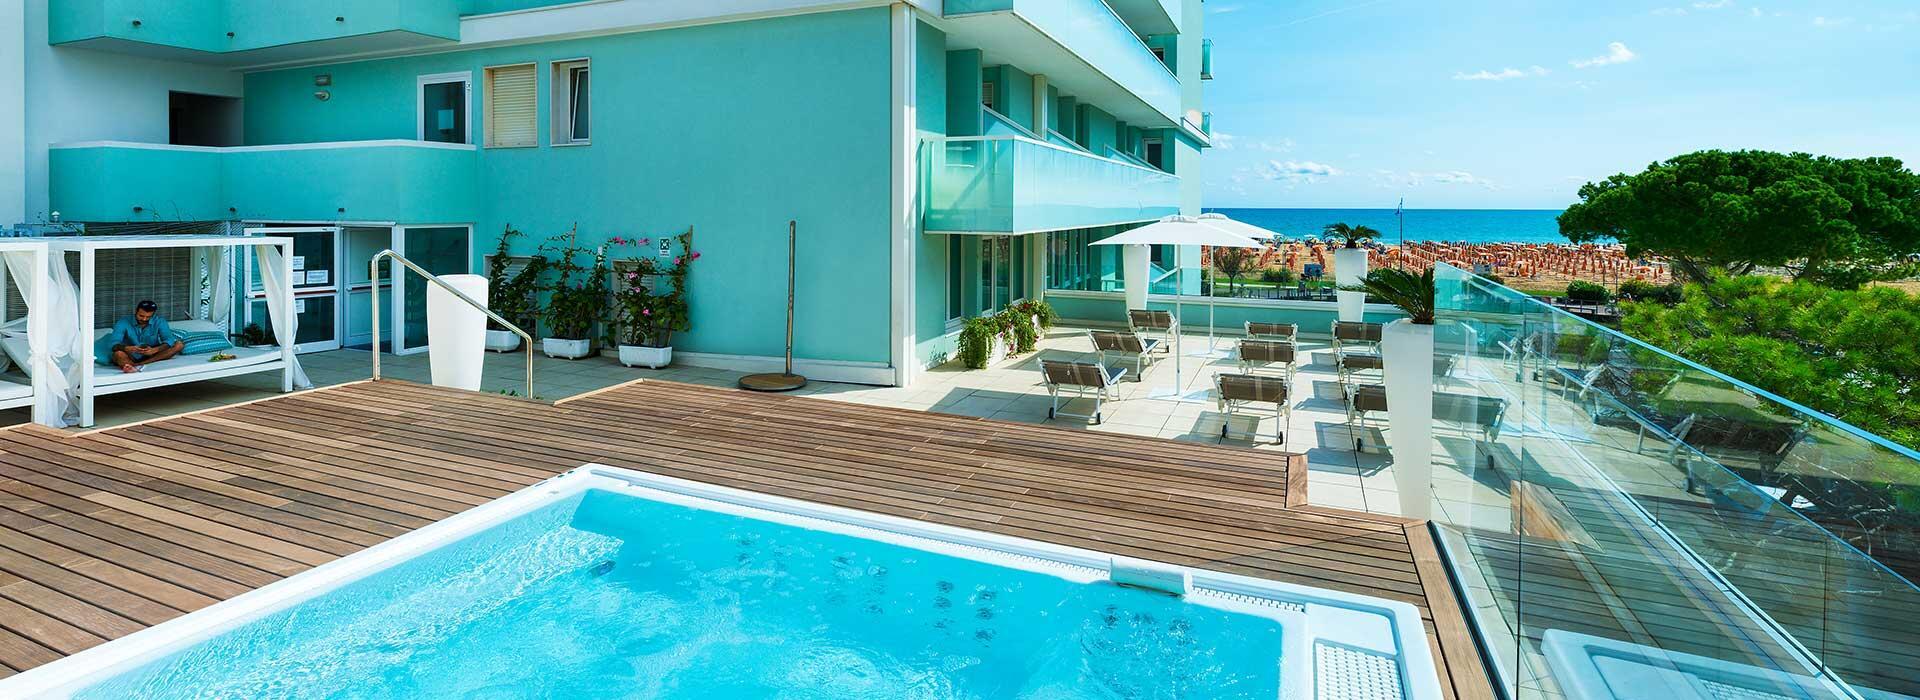 hotel-montecarlo pl uslugi 019